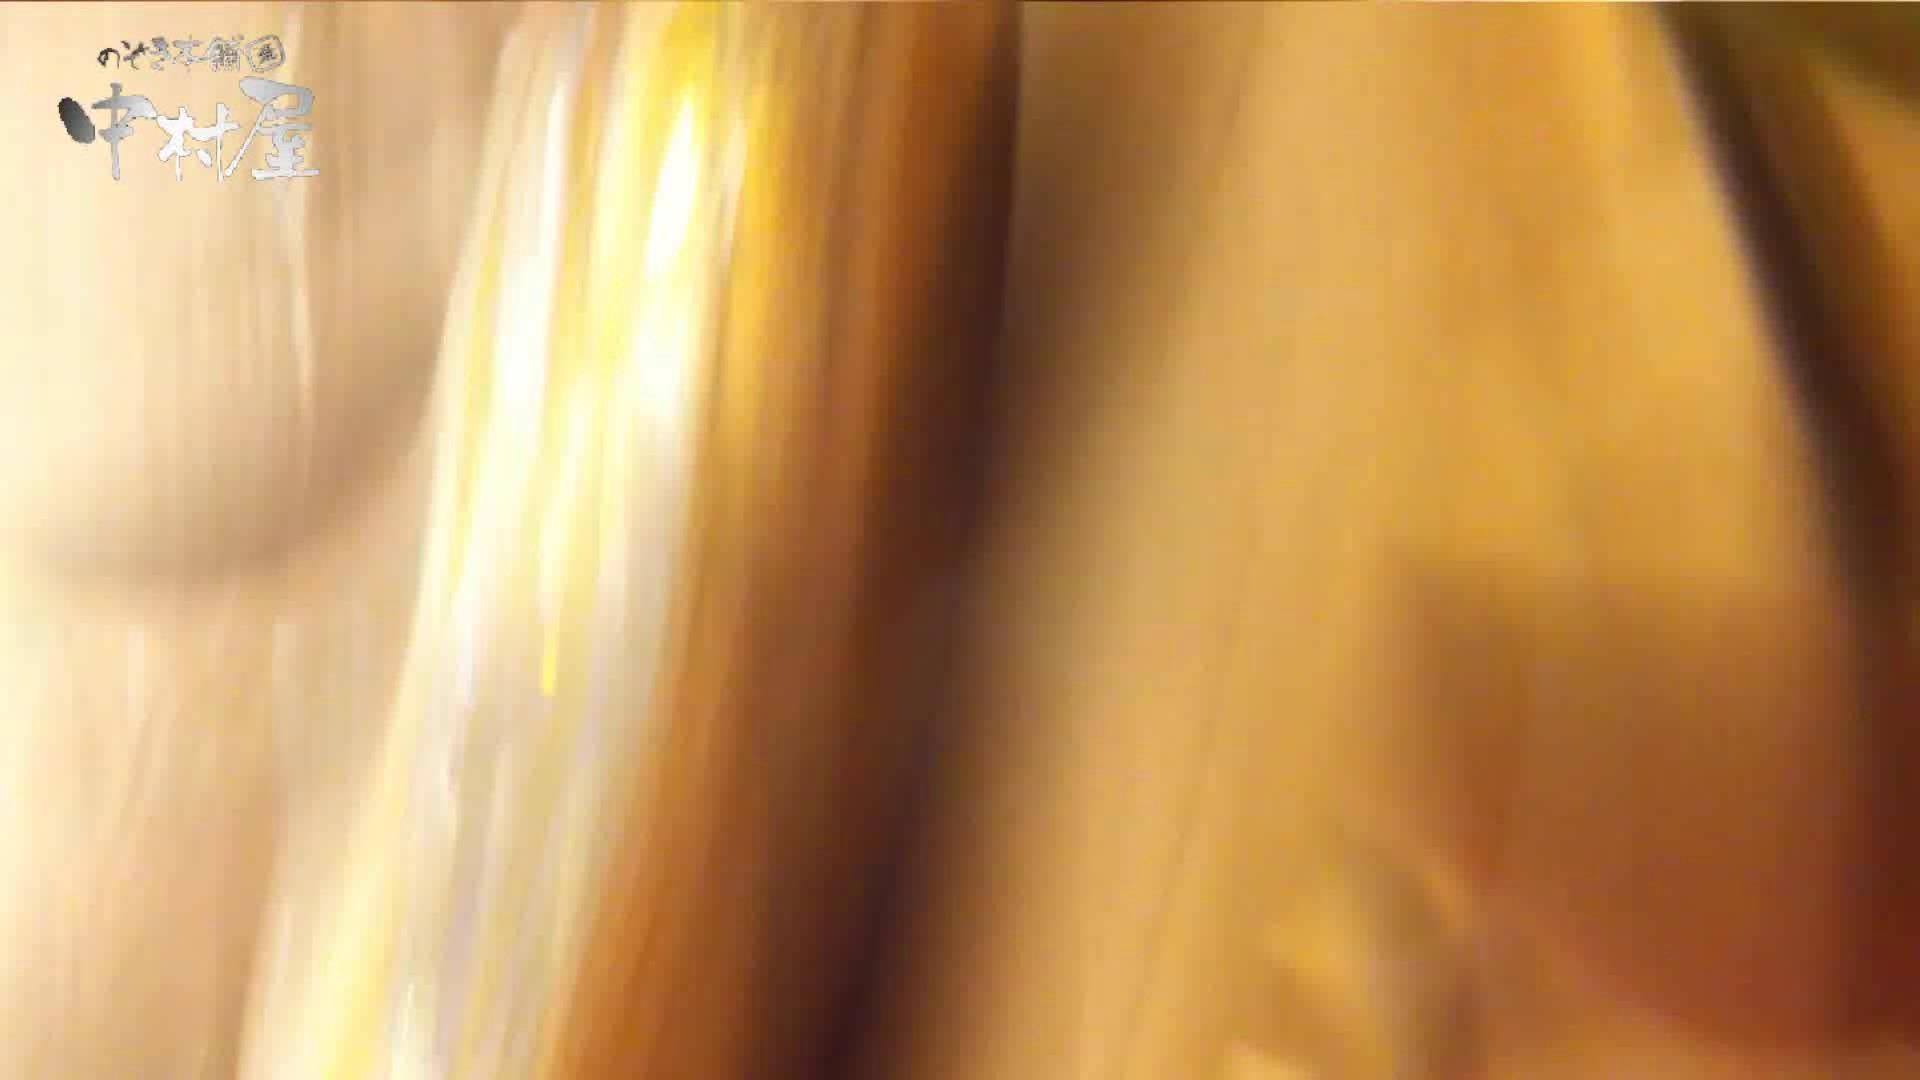 vol.43 可愛いカリスマ店員限定‼胸チラ&パンチラ 美脚おねーさんの胸元ゲット! パンチラ | HなOL  83pic 81